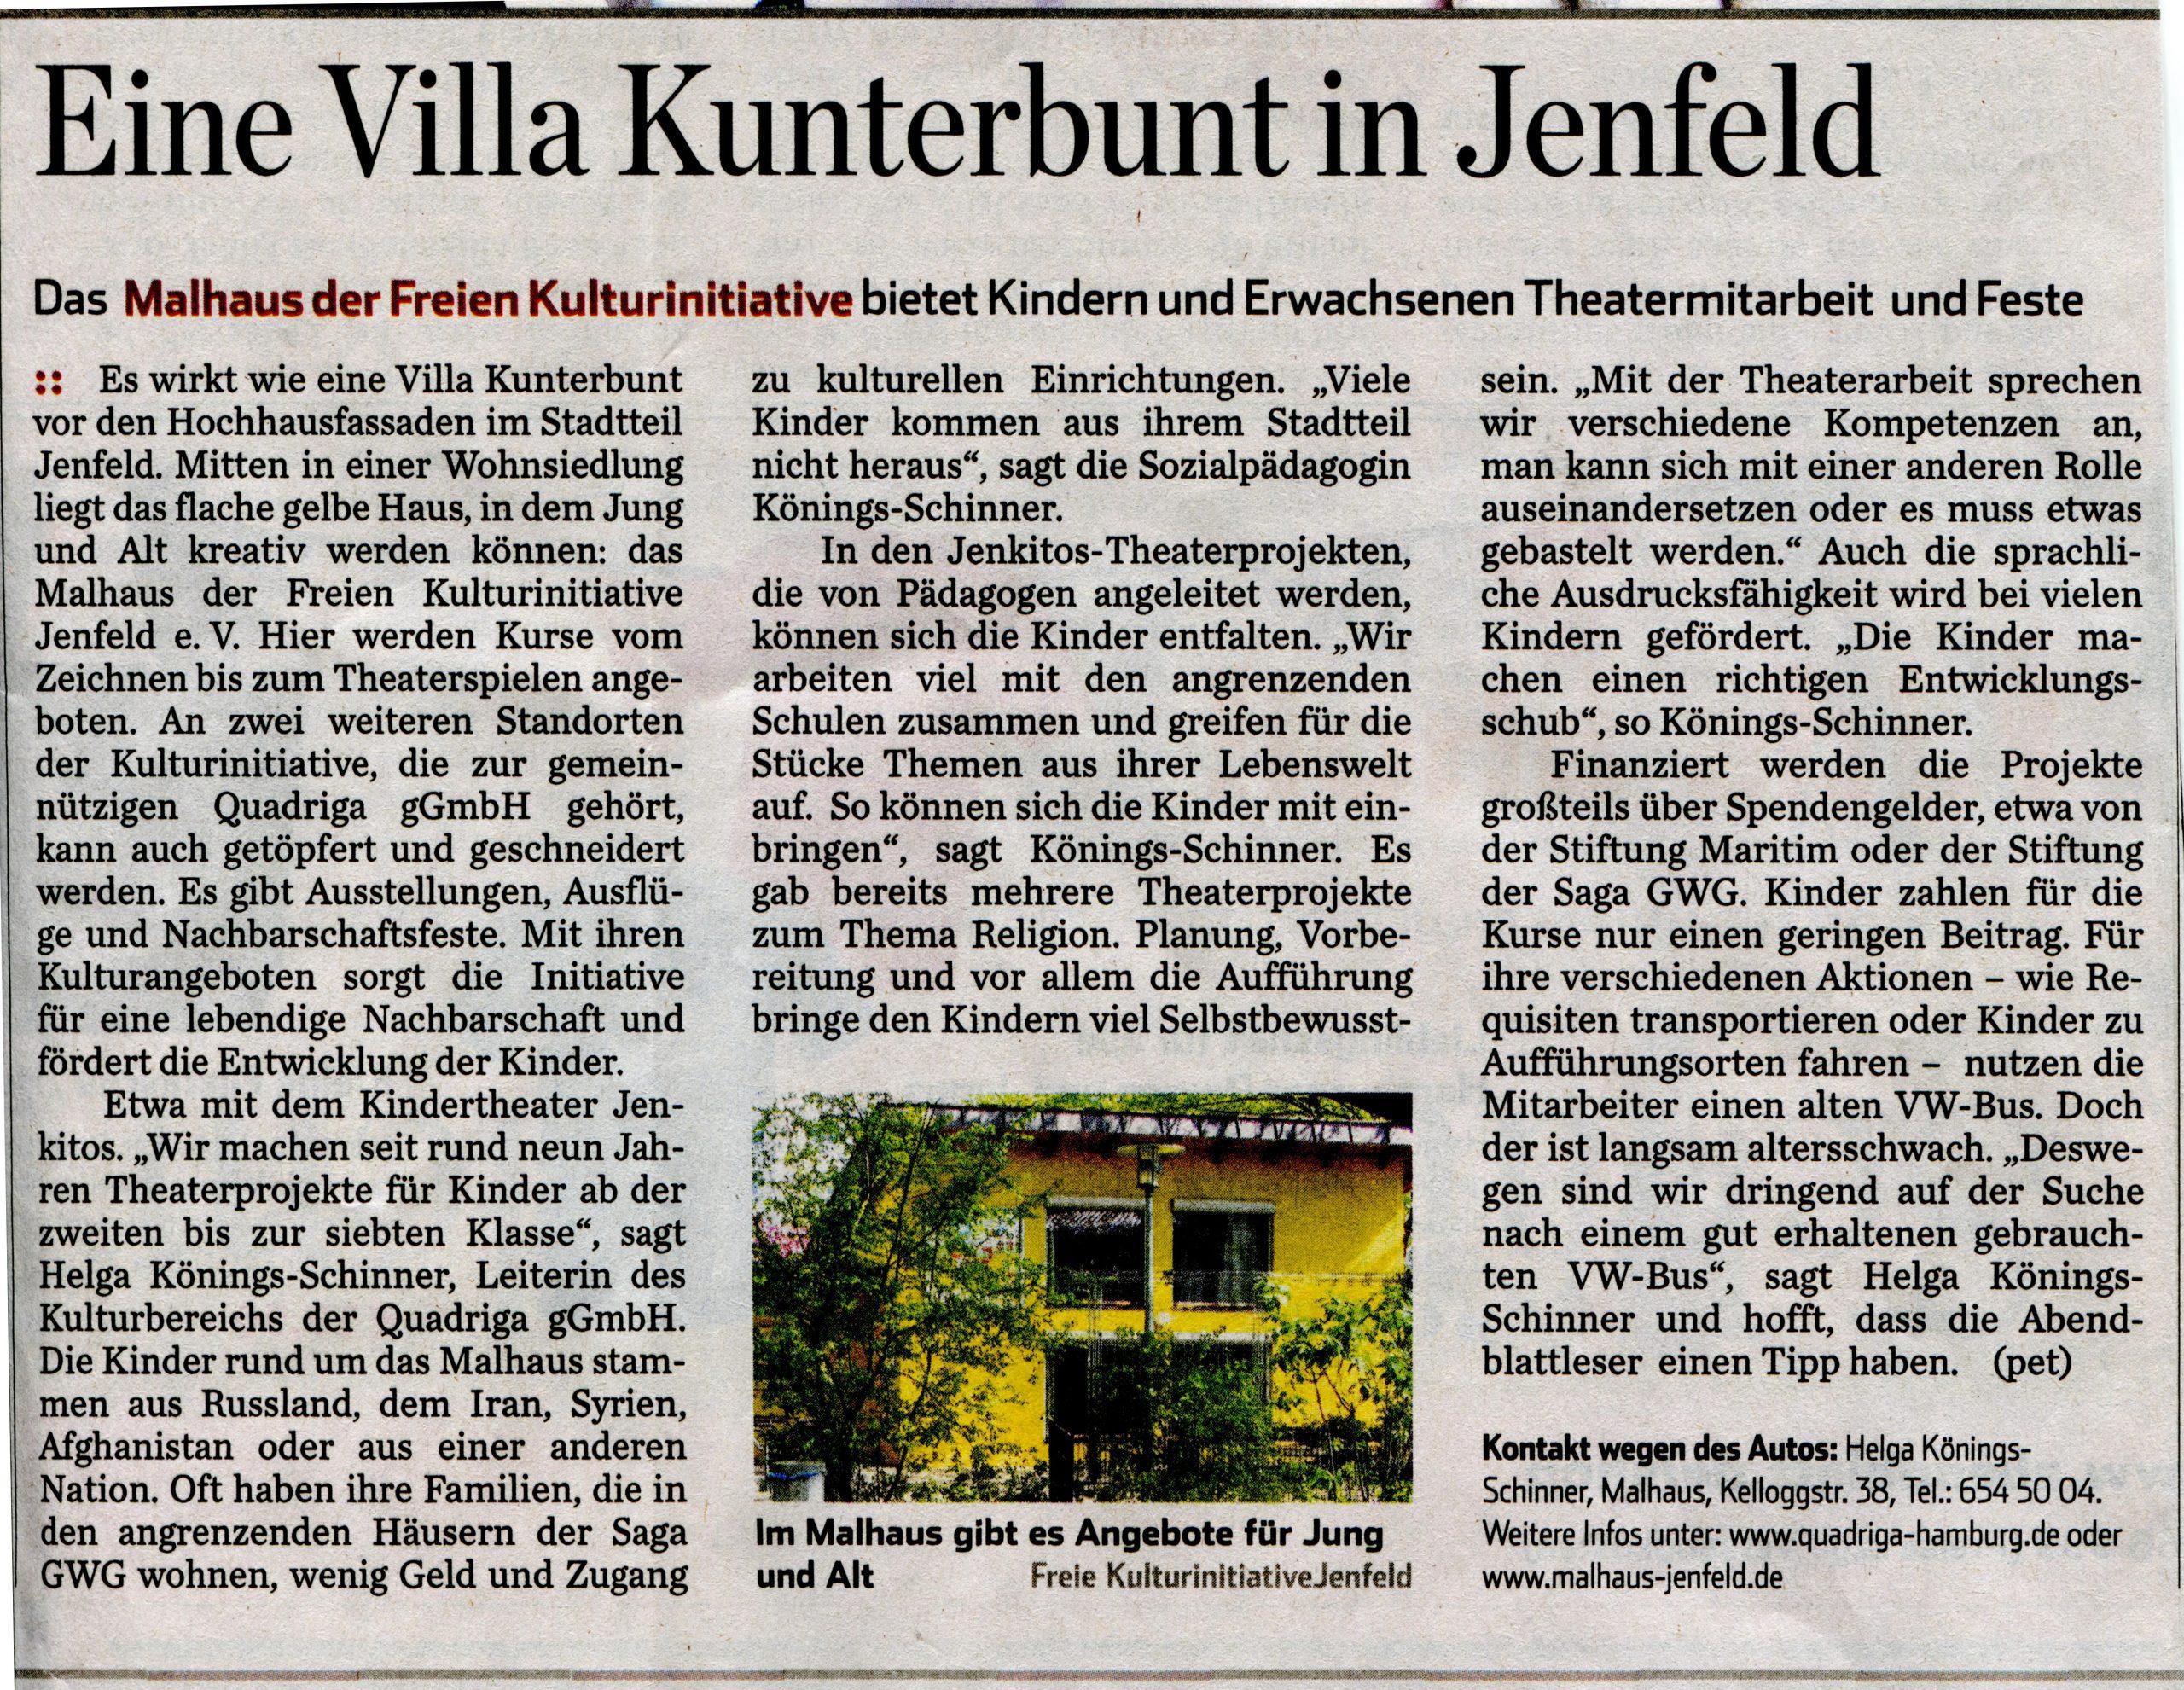 Eine_Villa_Kunterbunt_in_Jenfeld__Artikel_im_Abendblatt_am_4_Juli_2015kl